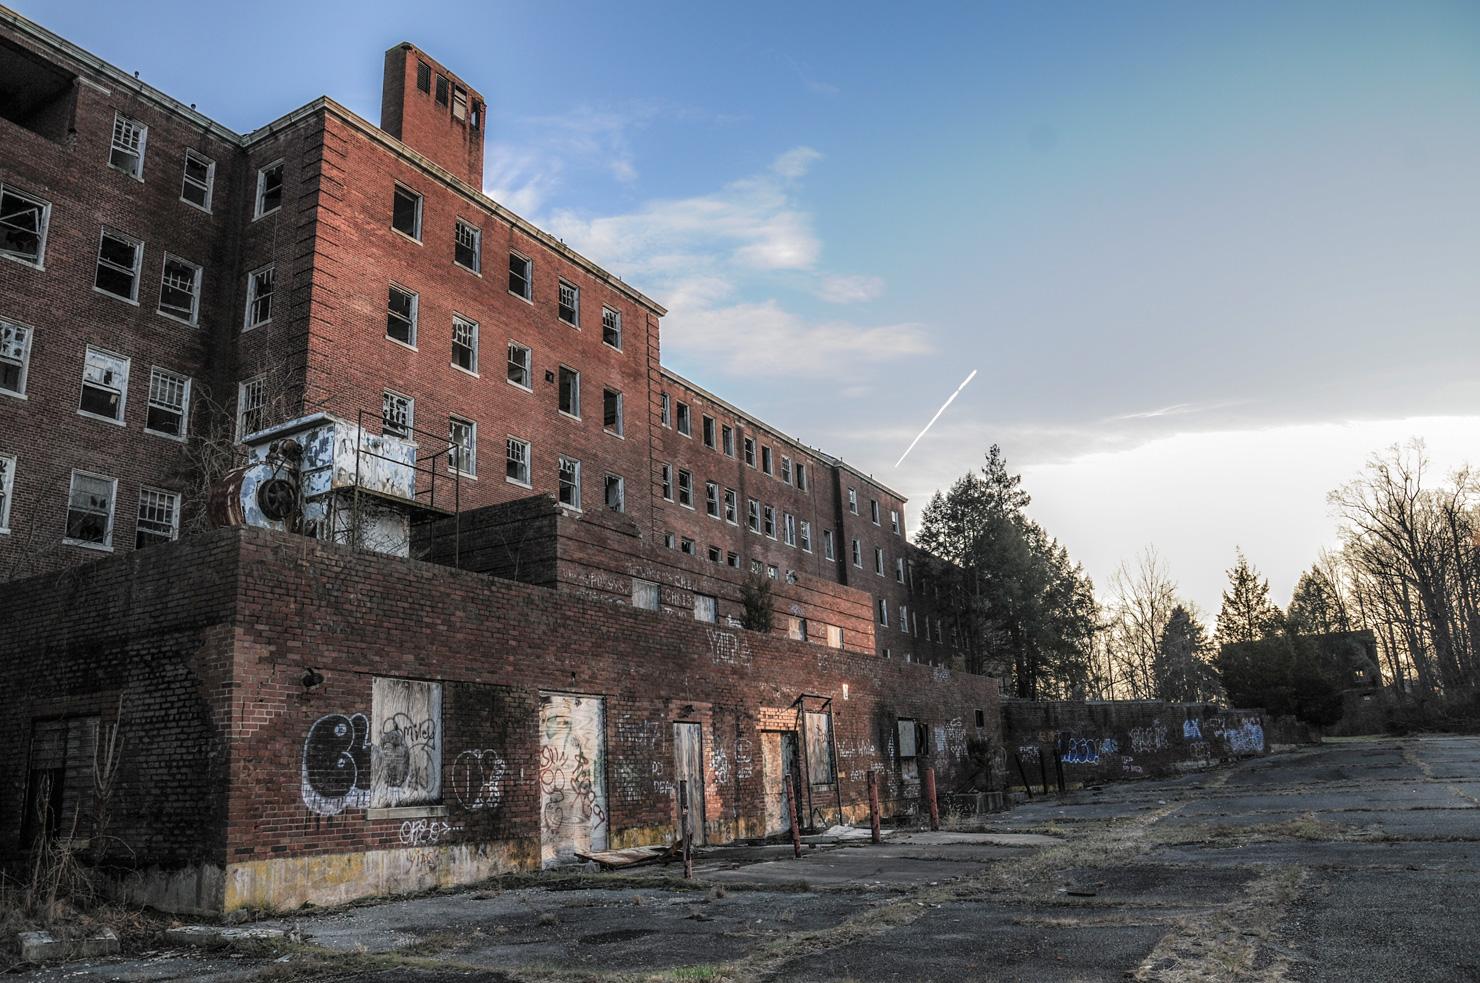 Glenn_Dale_Hospital_-_Adult_Hospital_Building_(side_view)